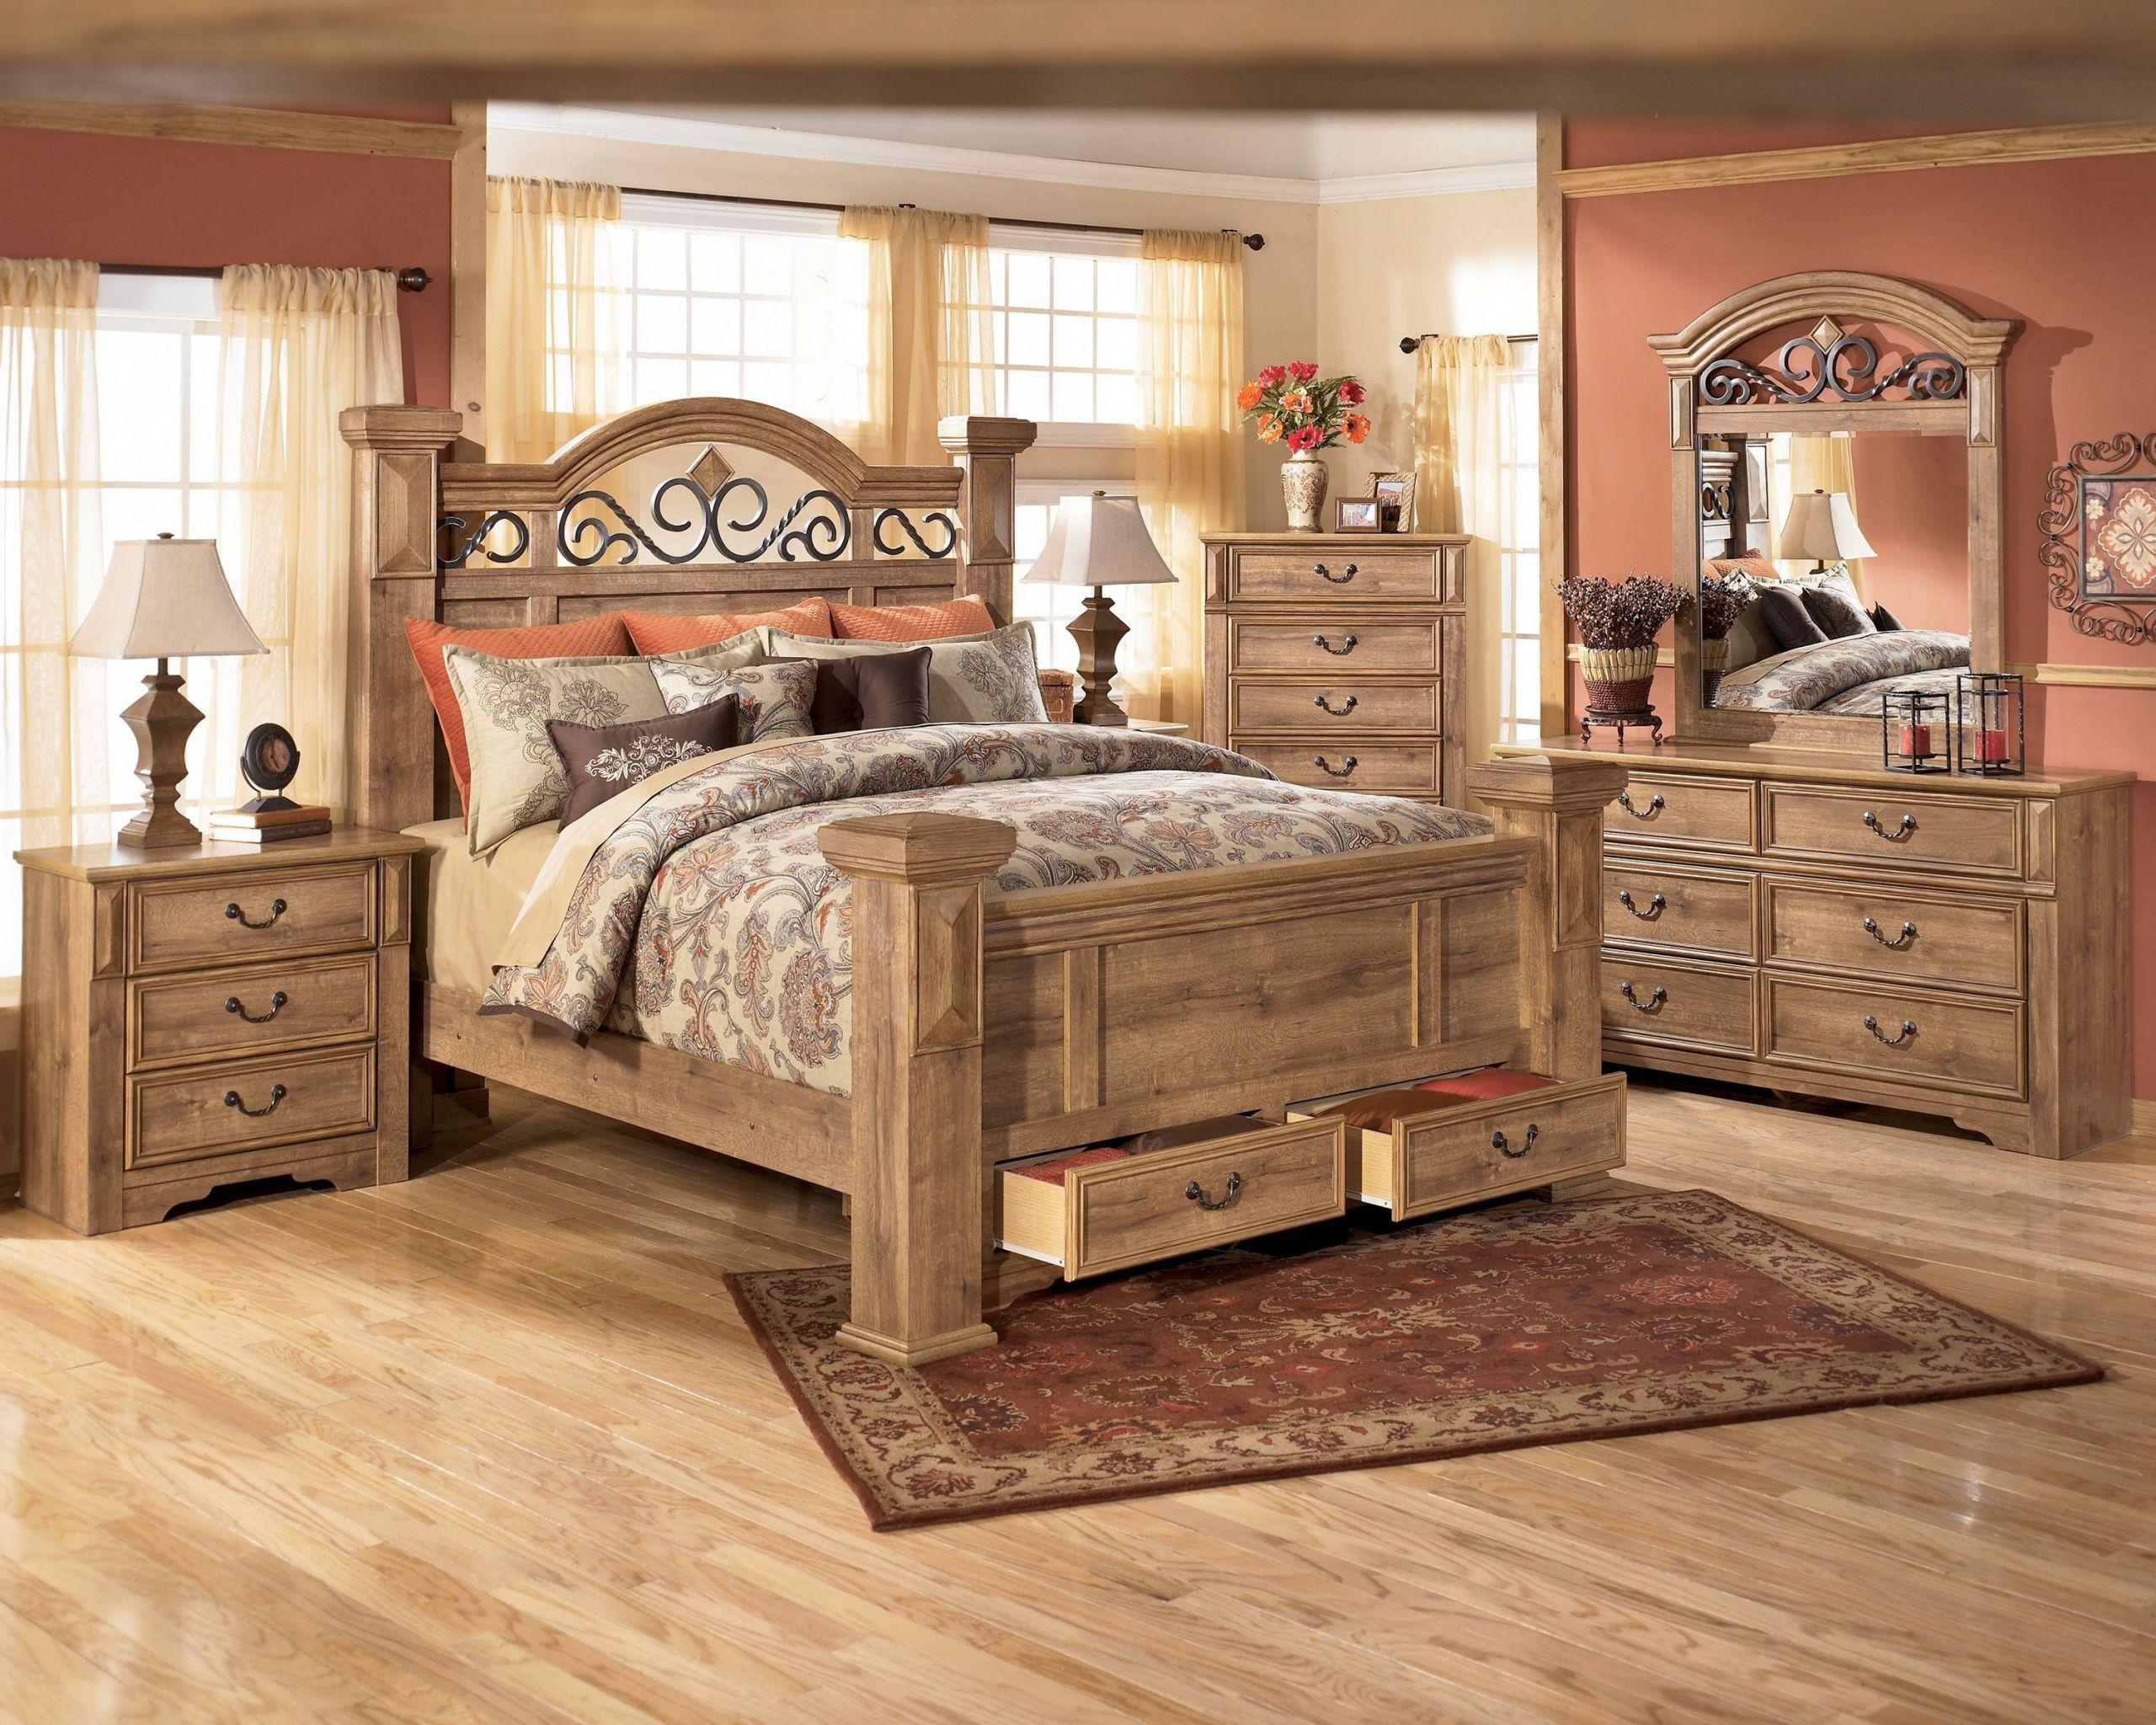 Rustic Bedroom Set King  Inspirational Rustic Bedroom Sets King rustic bedroom